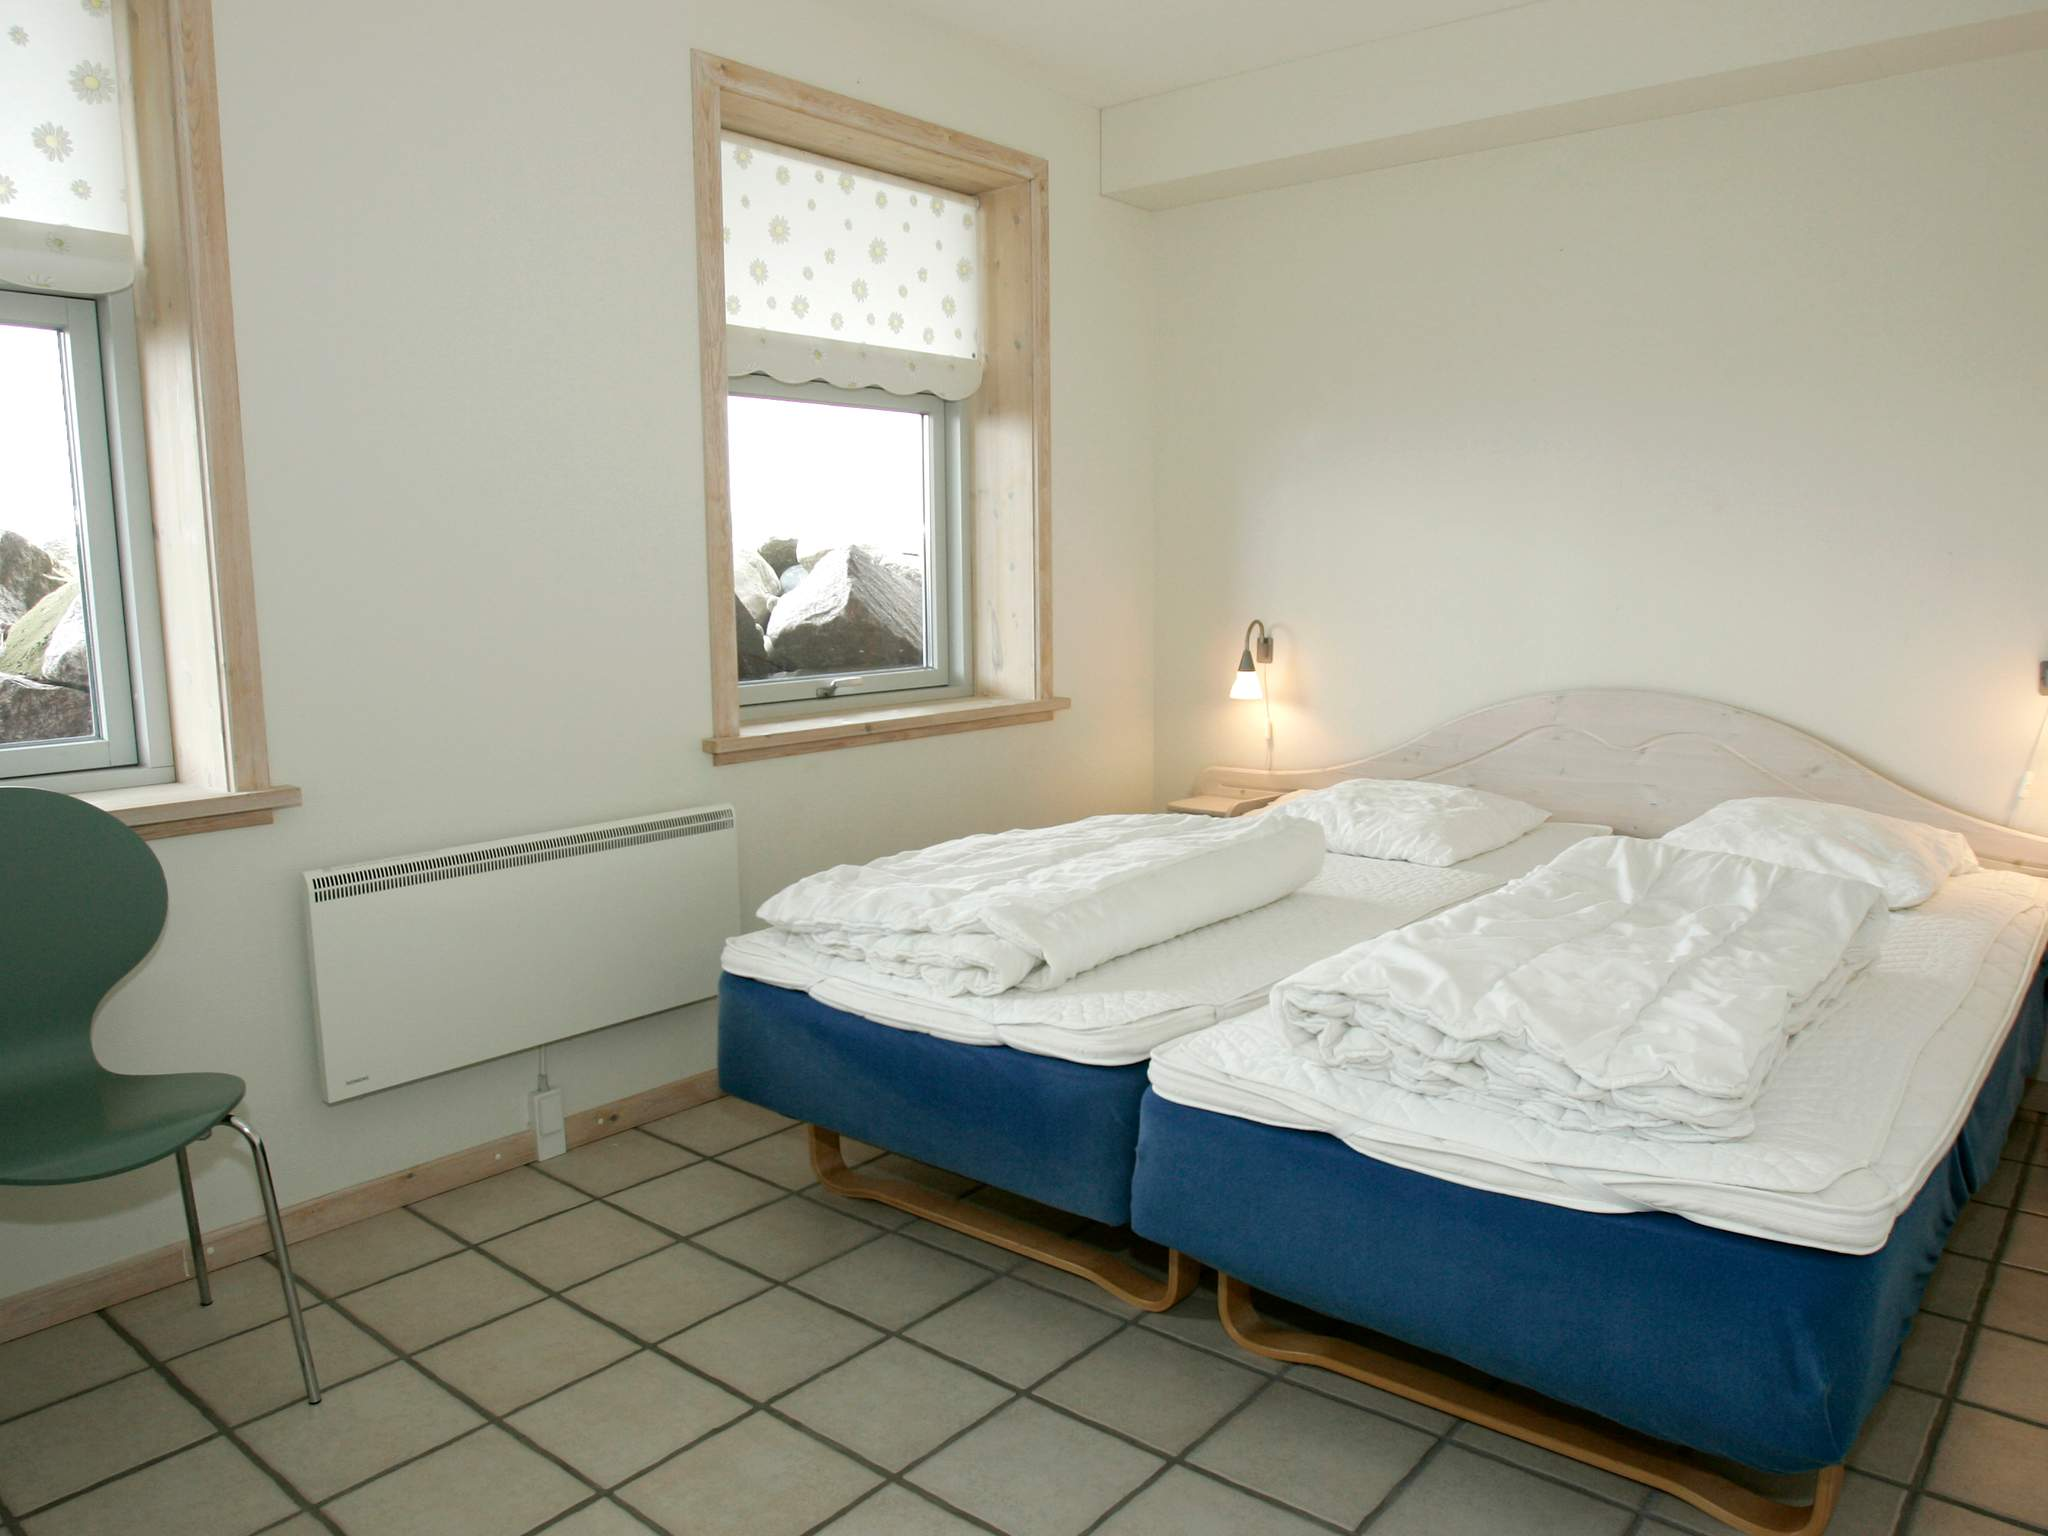 Ferienhaus Hasle (84885), Hasle, , Bornholm, Dänemark, Bild 10